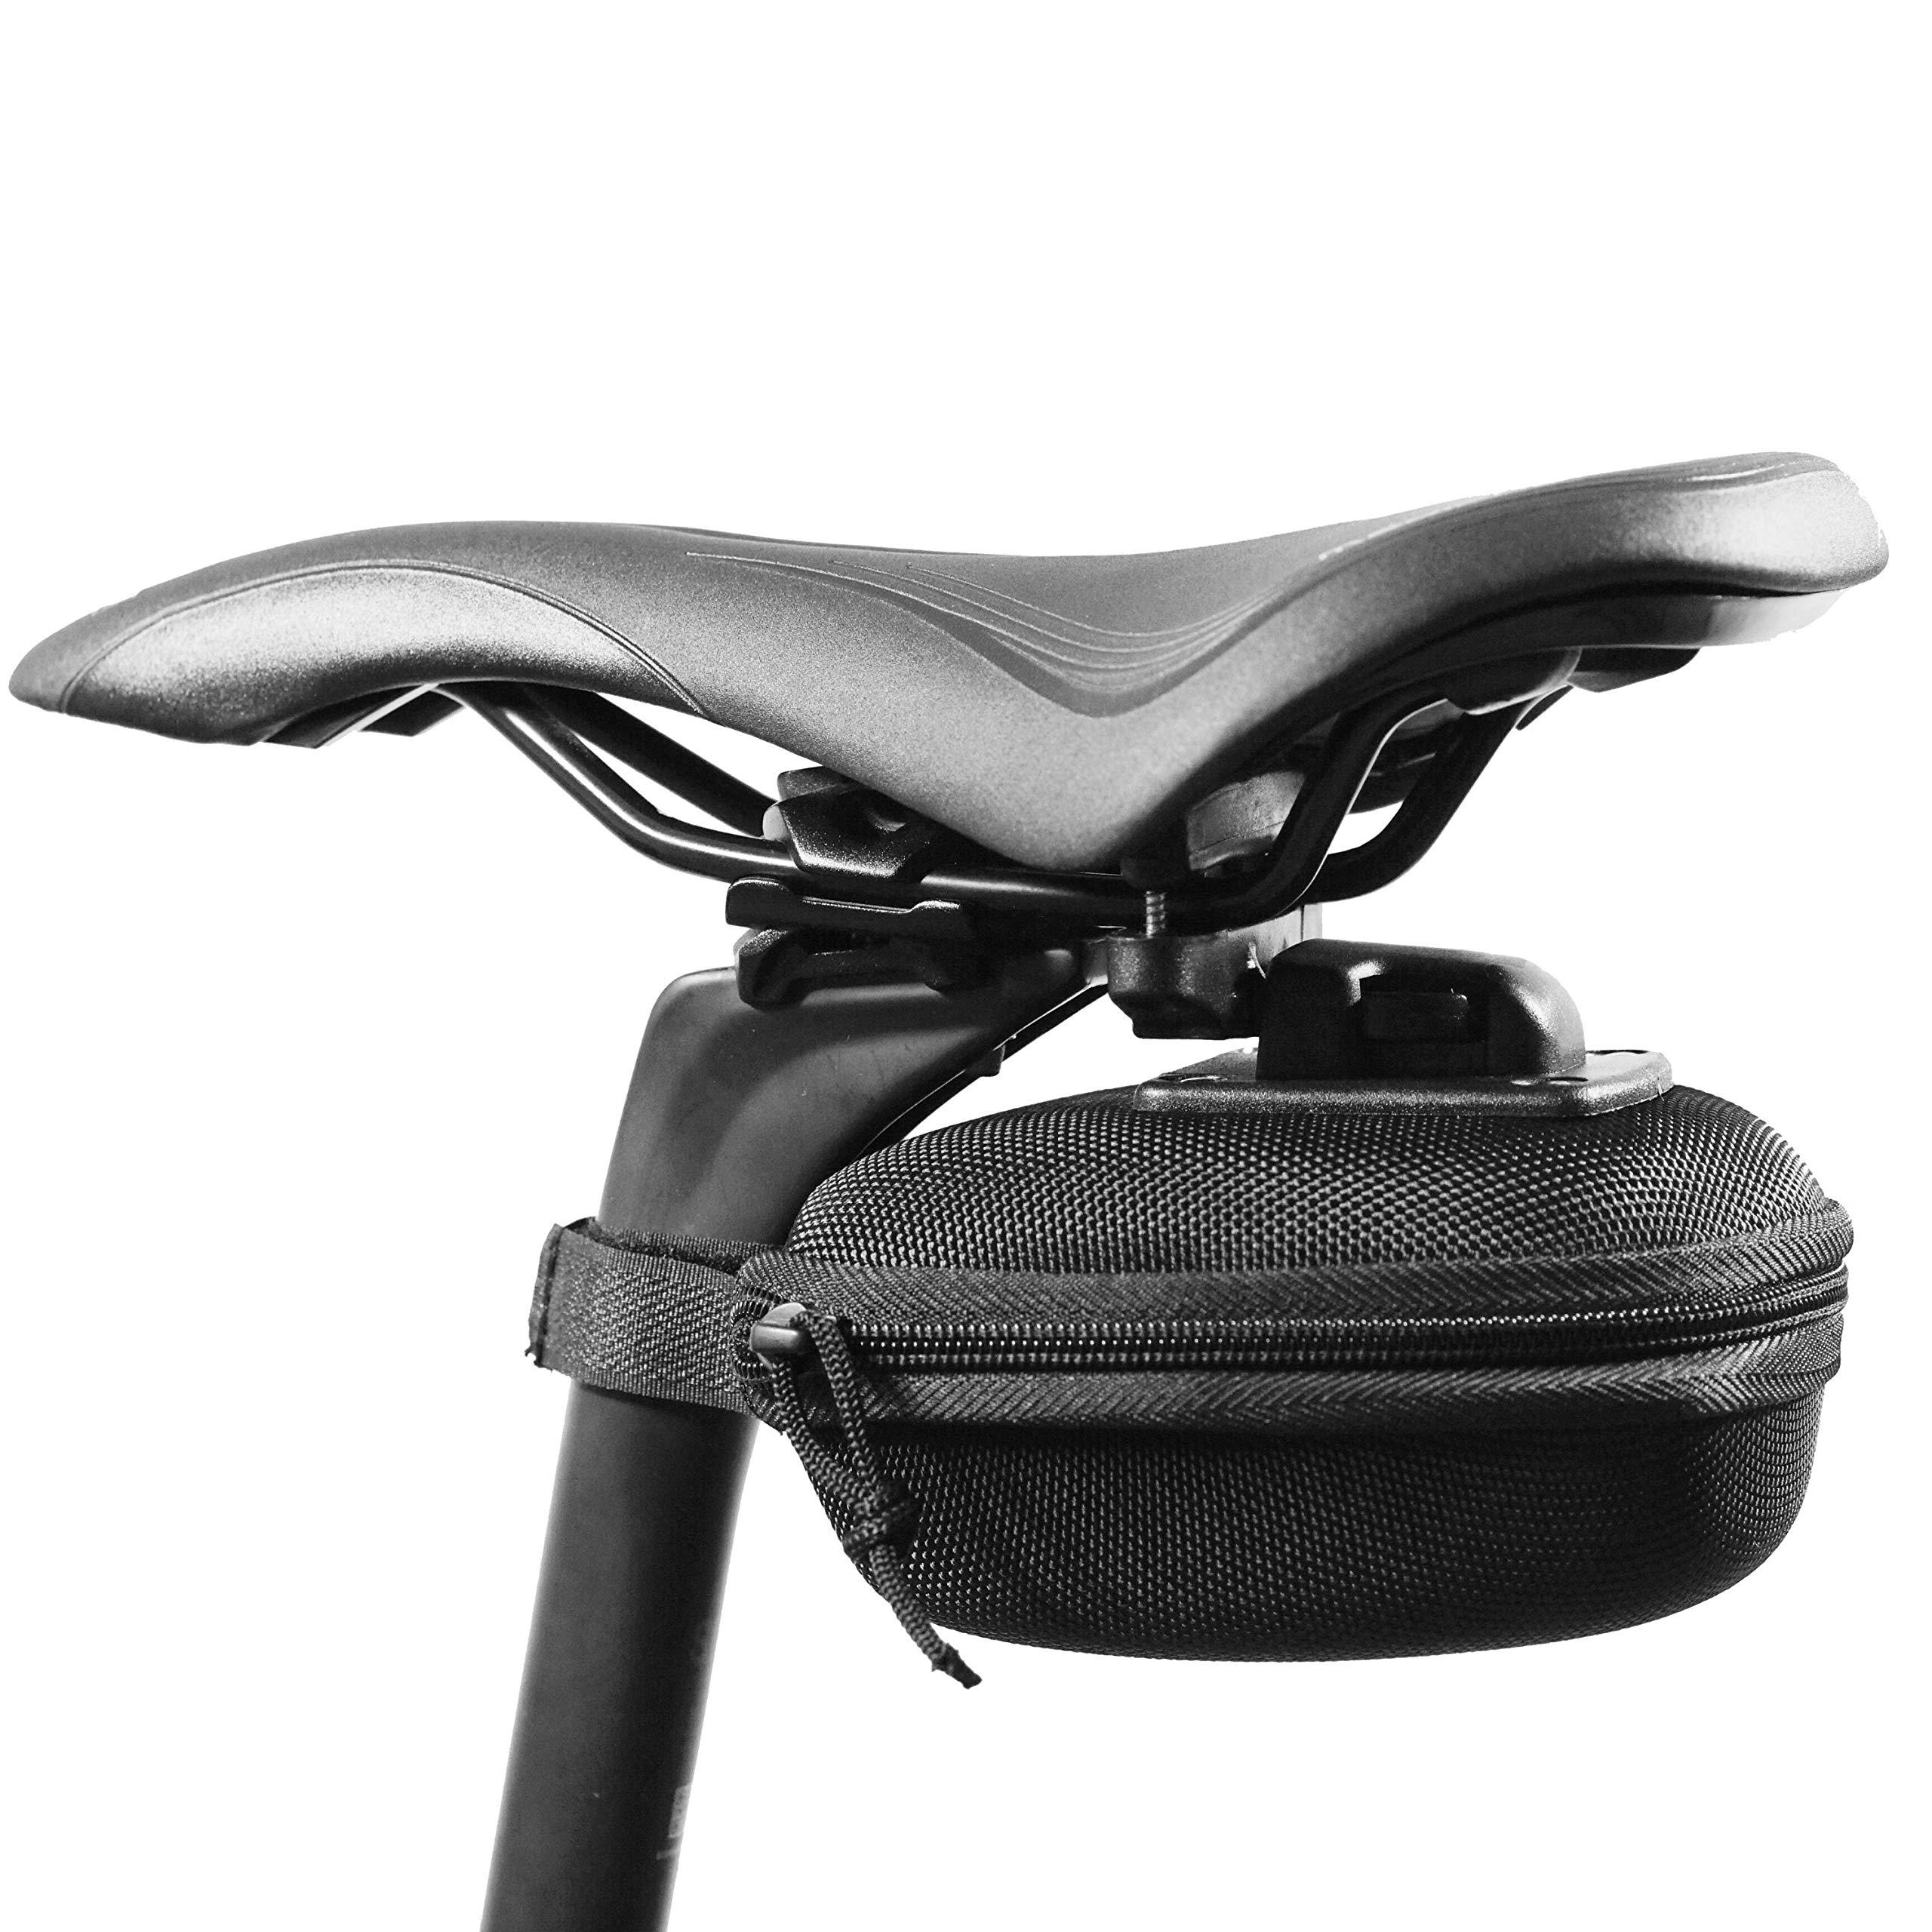 Vincita Stash Pack EVA Bicycle Saddle Bag - Medium Water-Resistant, Quick Release Fixing,Big Zippered Opening Seat Cycling Tool Bag Portable Storage, for Road Mountain Bike Folding Bike Adult Bike